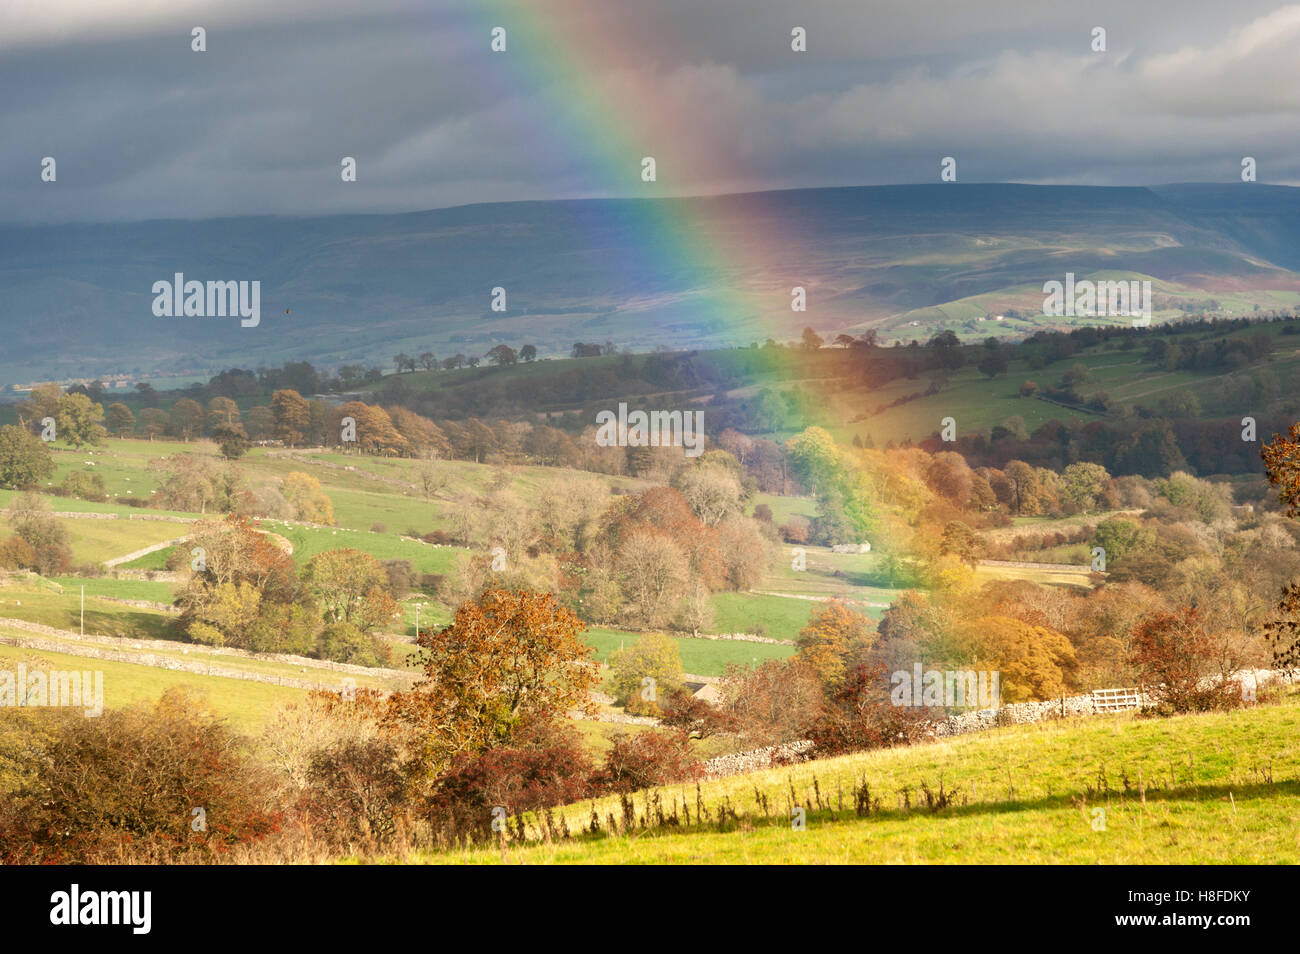 Rainbow over farmland, overlooking the Eden Valley, Cumbria, UK. - Stock Image